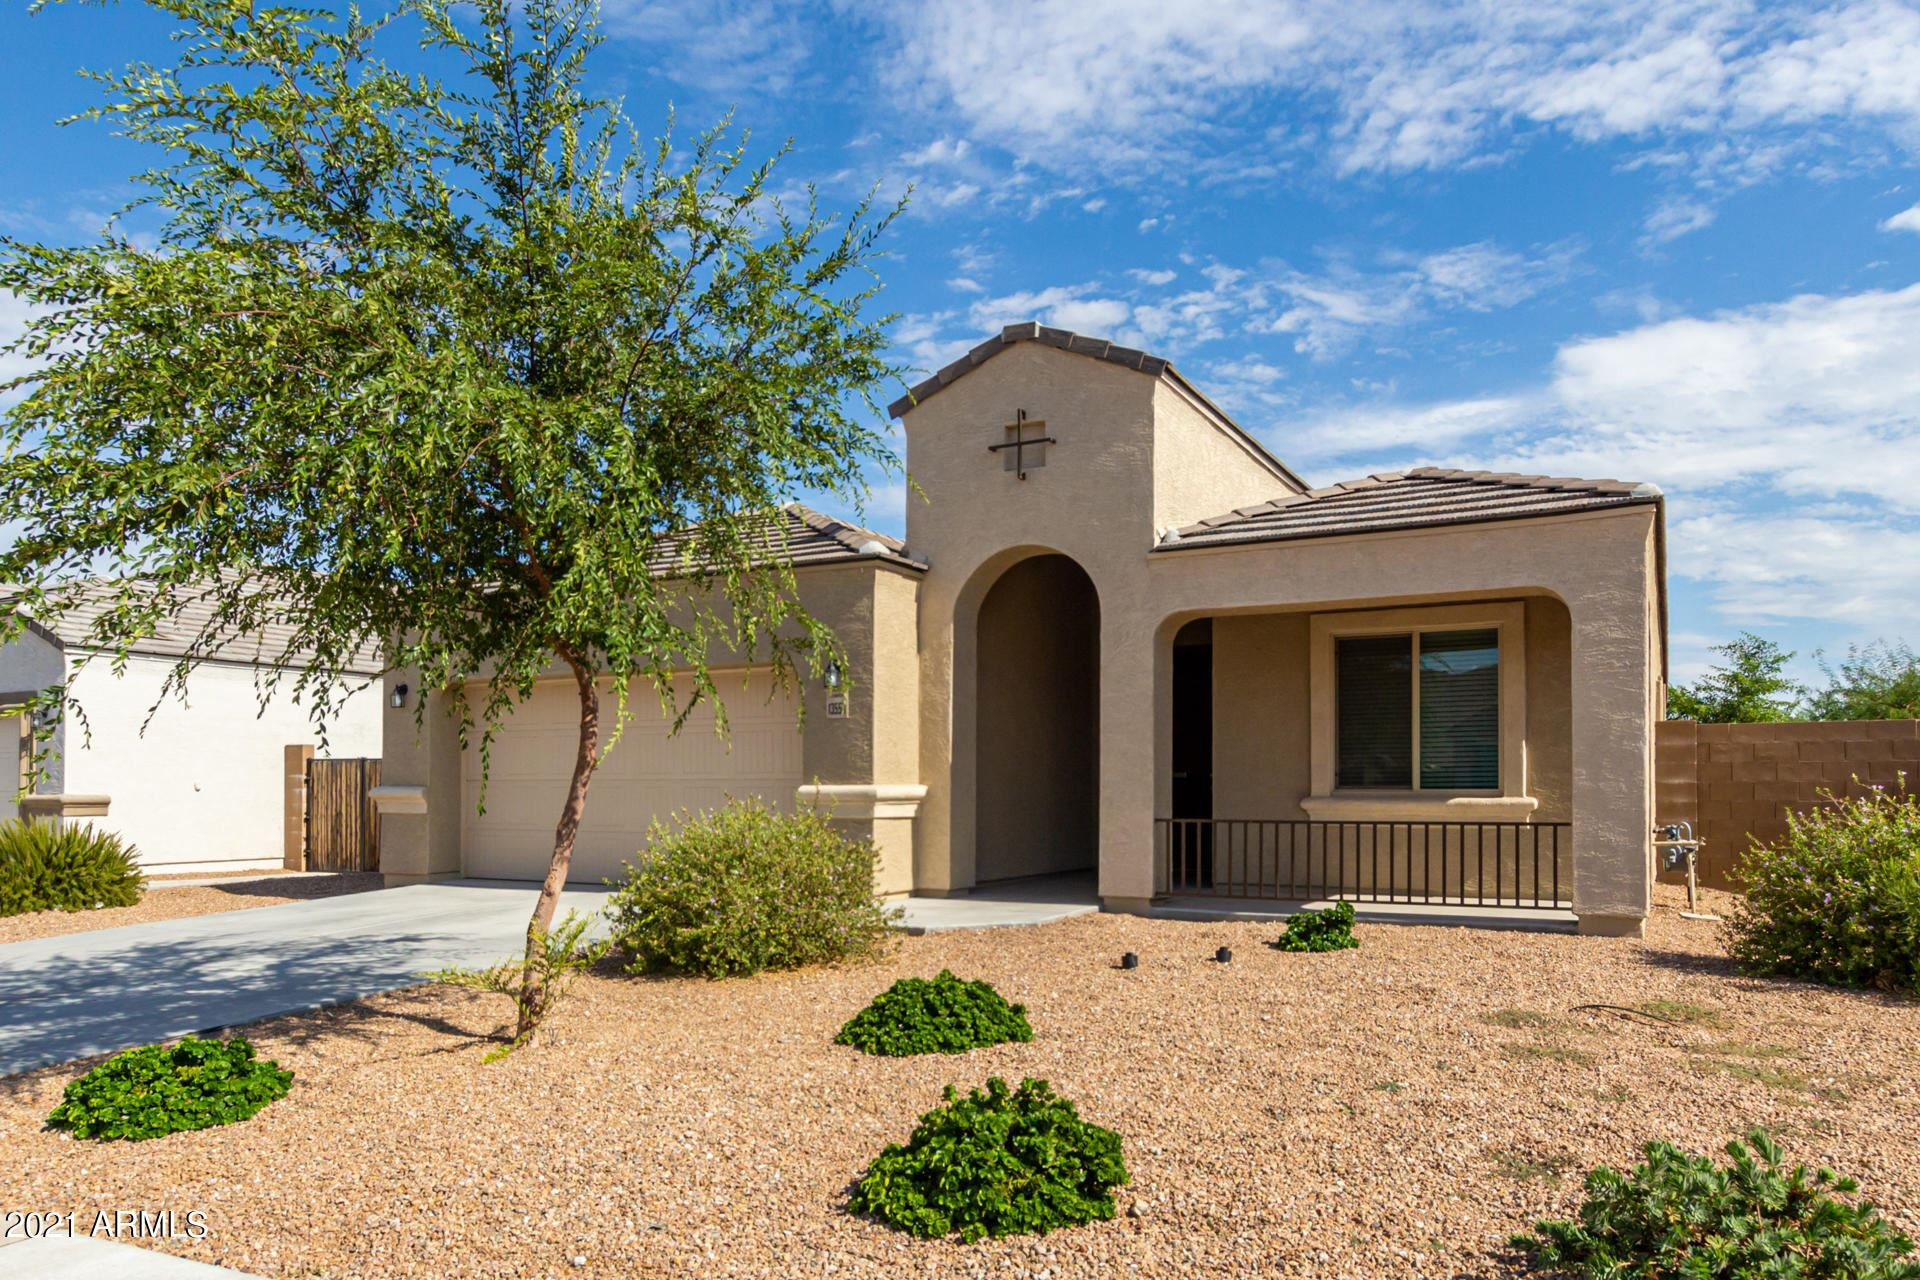 13553 W BRILES Road, Peoria, AZ 85383 - MLS#: 6262026